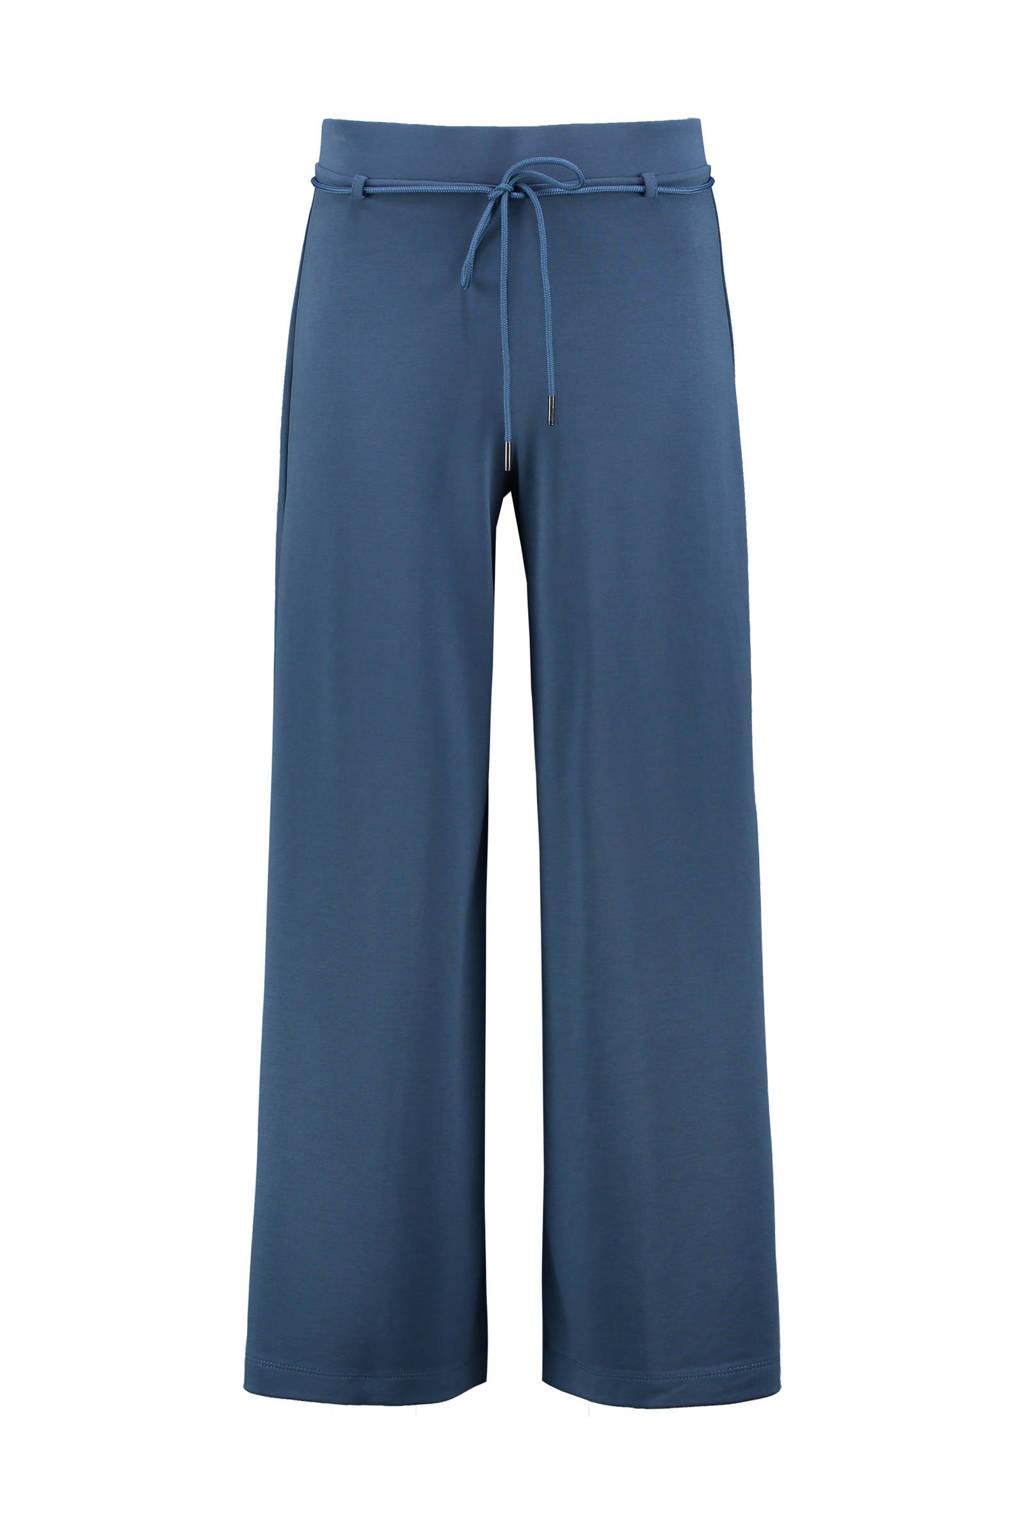 Expresso wide leg palazzo broek donkerblauw, Donkerblauw